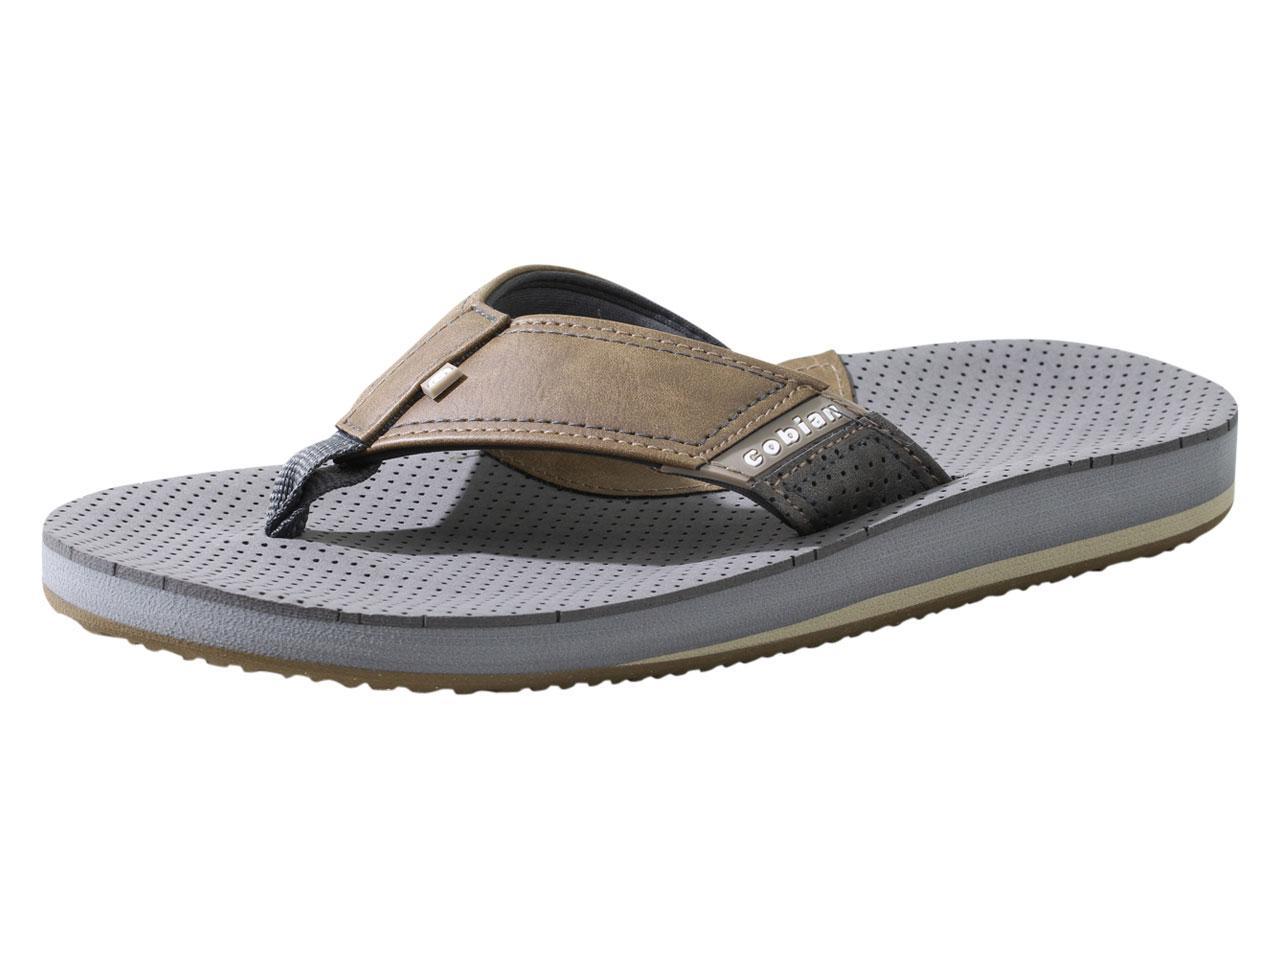 Image of Cobian Men's A.R.V. II Flip Flops Sandals Shoes - Chocolate - 8 D(M) US